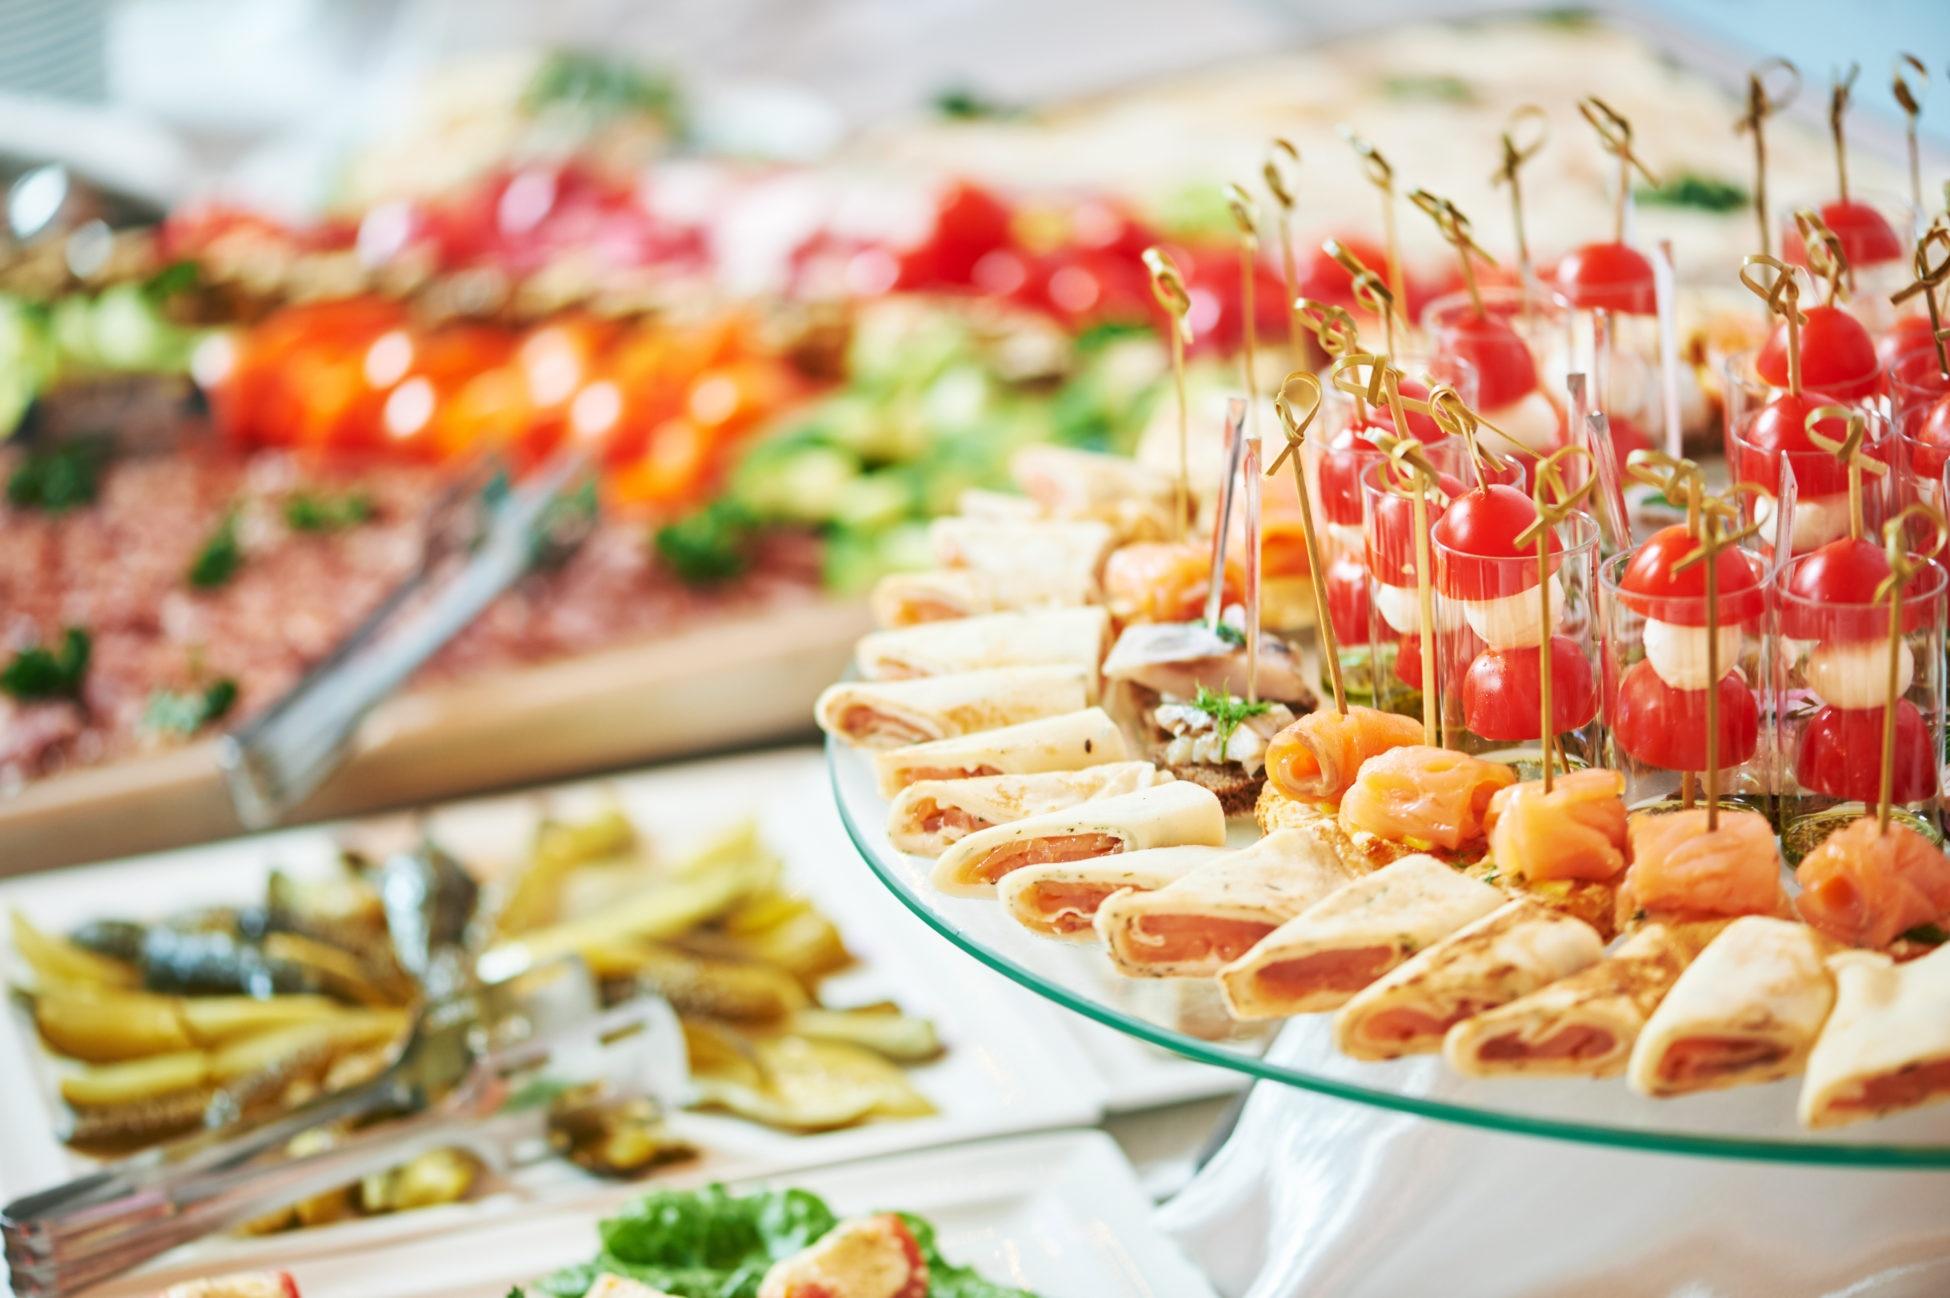 bigstock-catering-service-restaurant-t-112081613_112119050726.jpg